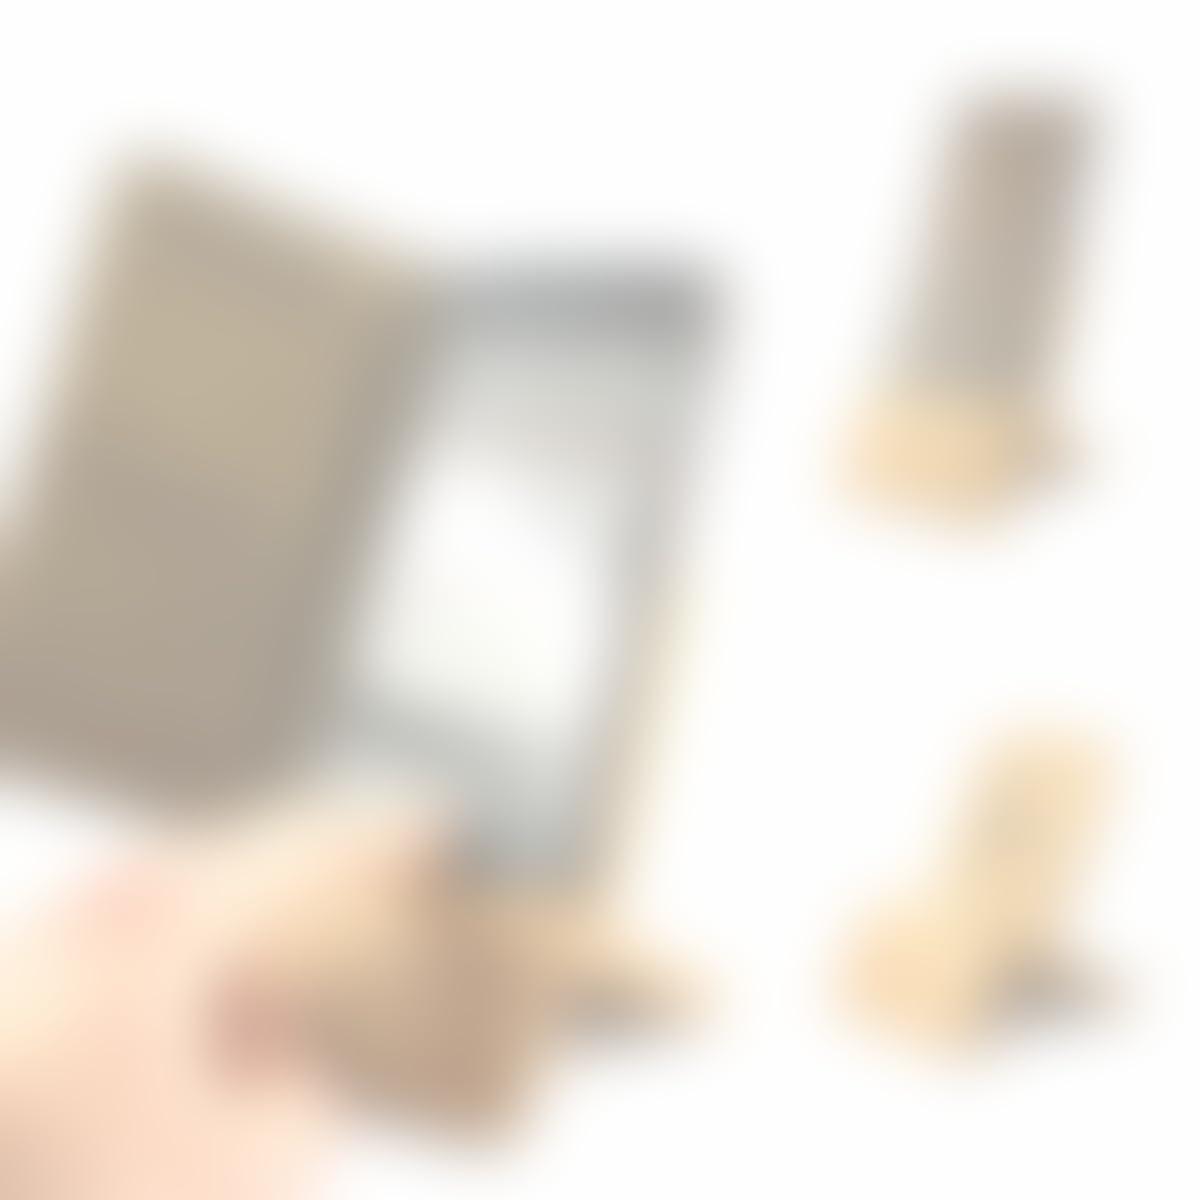 Handytasche Samsung Galaxy A5 2017 Handyh/ülle Smartphone Filzh/ülle Handy H/ülle Tasche Cover Case Filz Wollfilz herz am stiel kinkerlitzchen handmade herzballon herzblume verspielt Geschenk Freundin